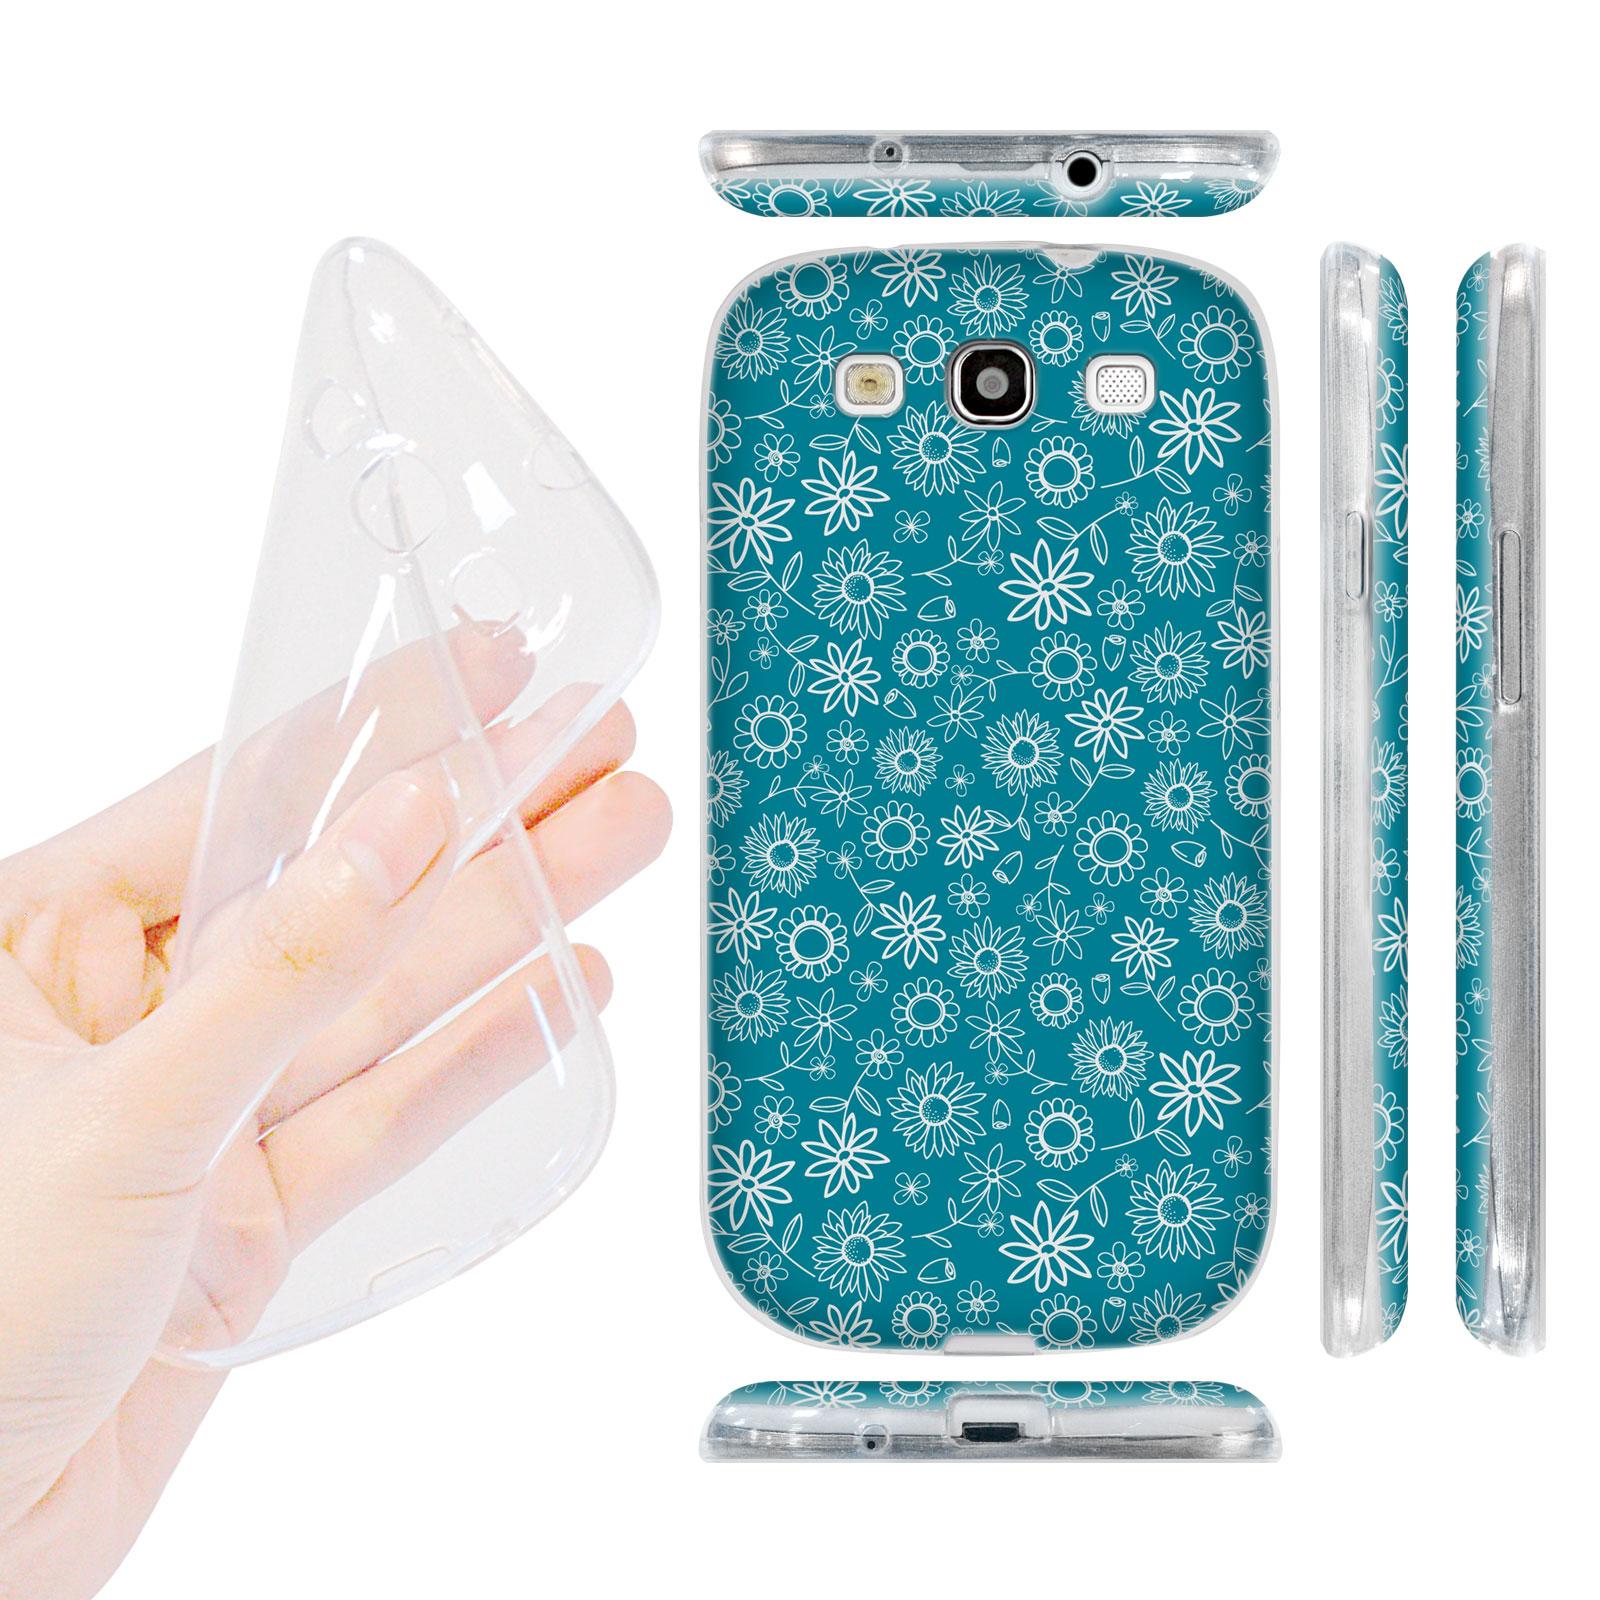 HEAD CASE silikonový obal na mobil Galaxy S3 i9300 malé květinky modrá barva